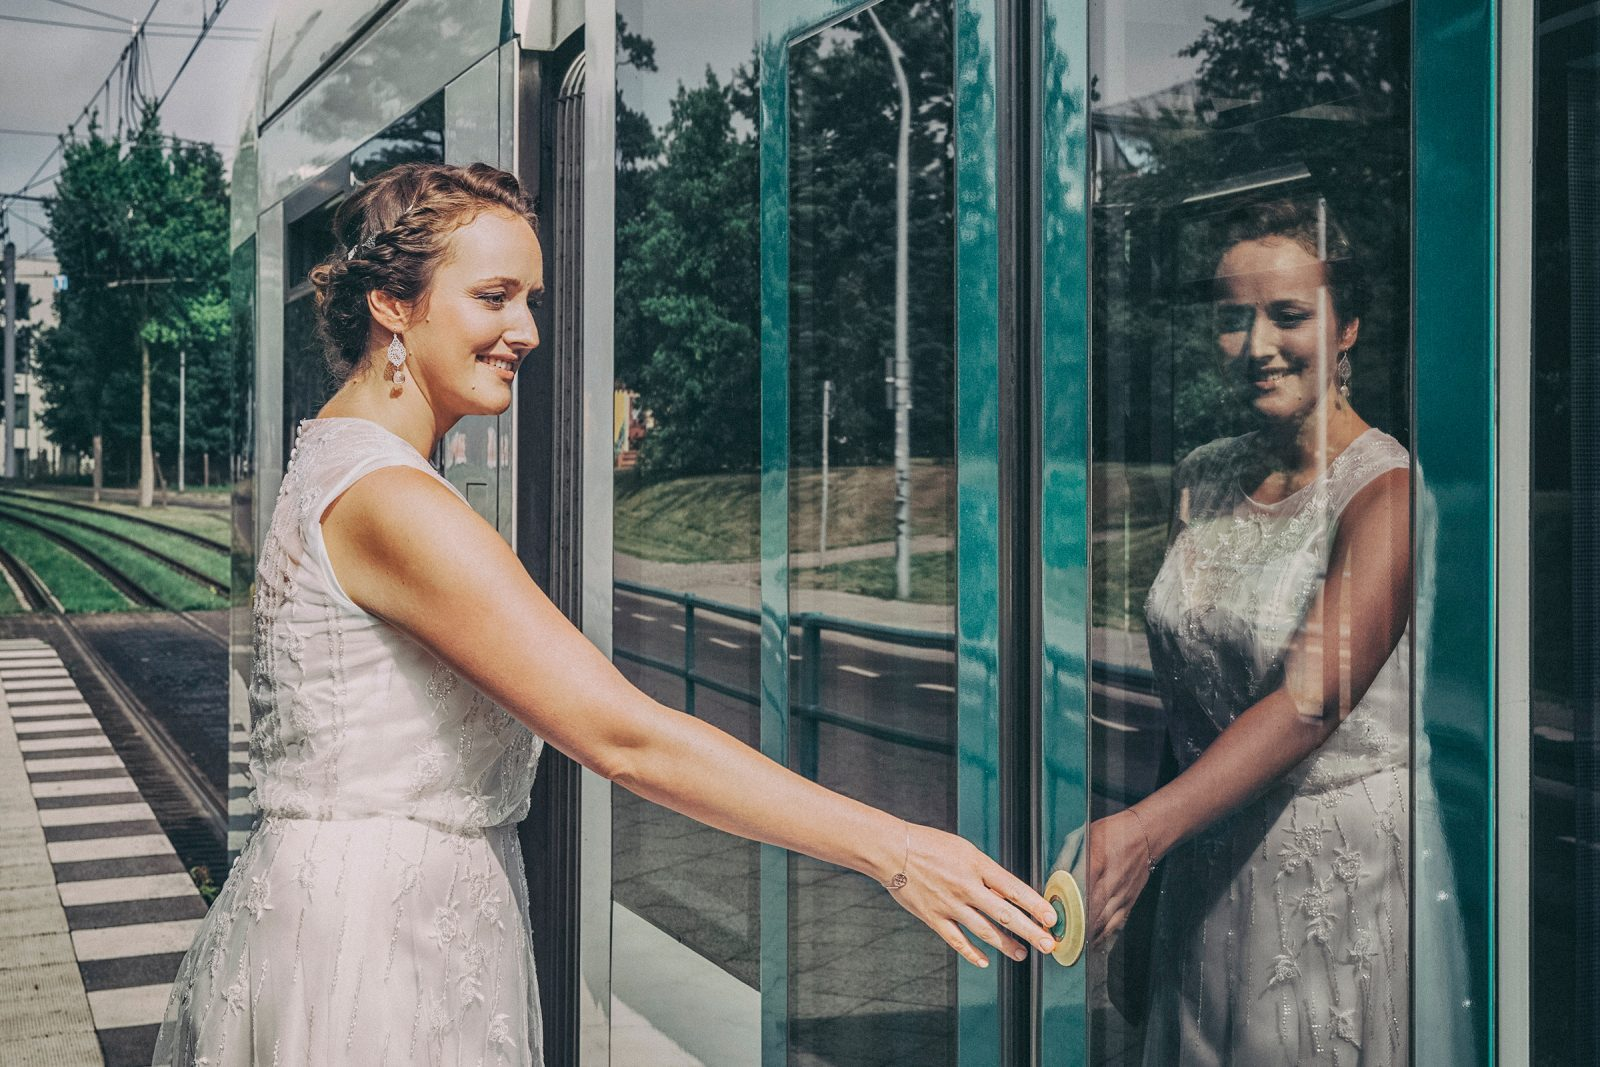 Hochzeit_Potsdam_fotograf_G2